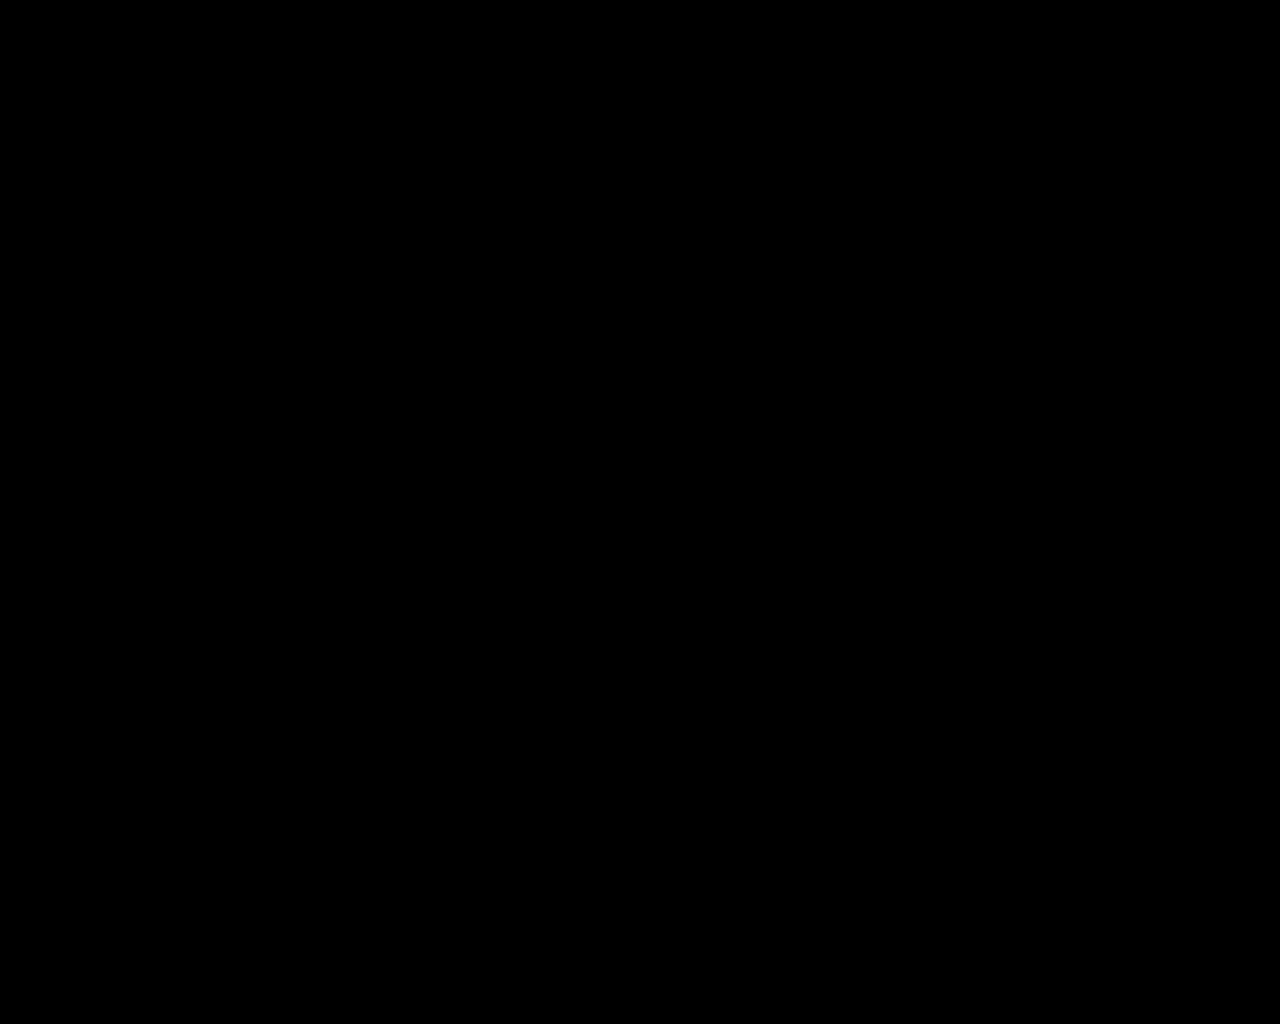 Add 10 Black Pixels (10 per user)